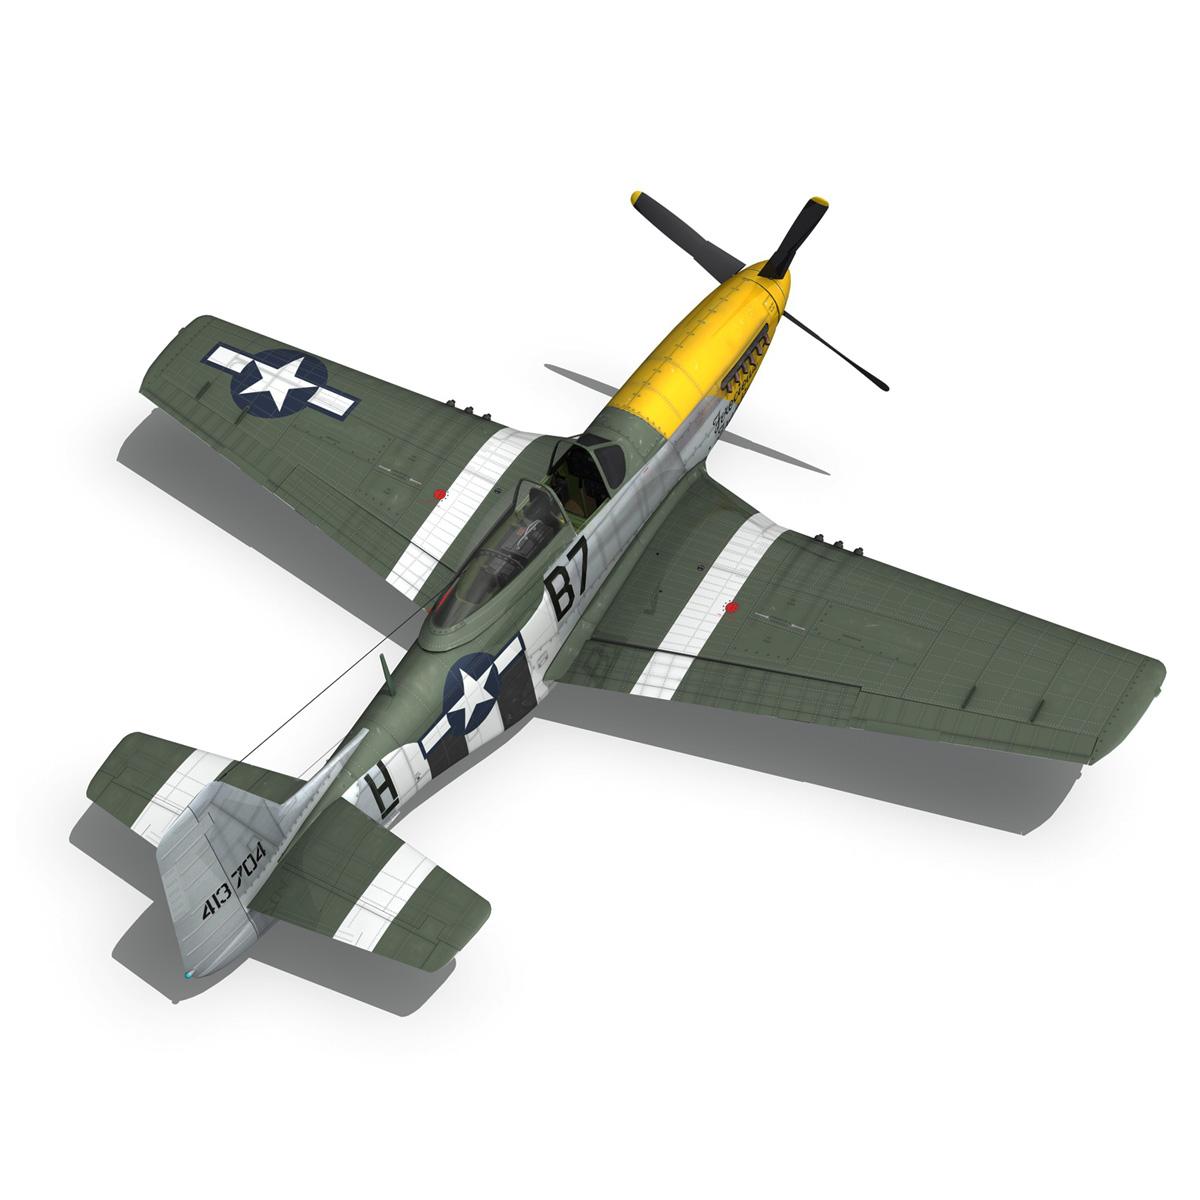 north american p-51d mustang – ferocious frankie 3d model fbx c4d lwo obj 269497